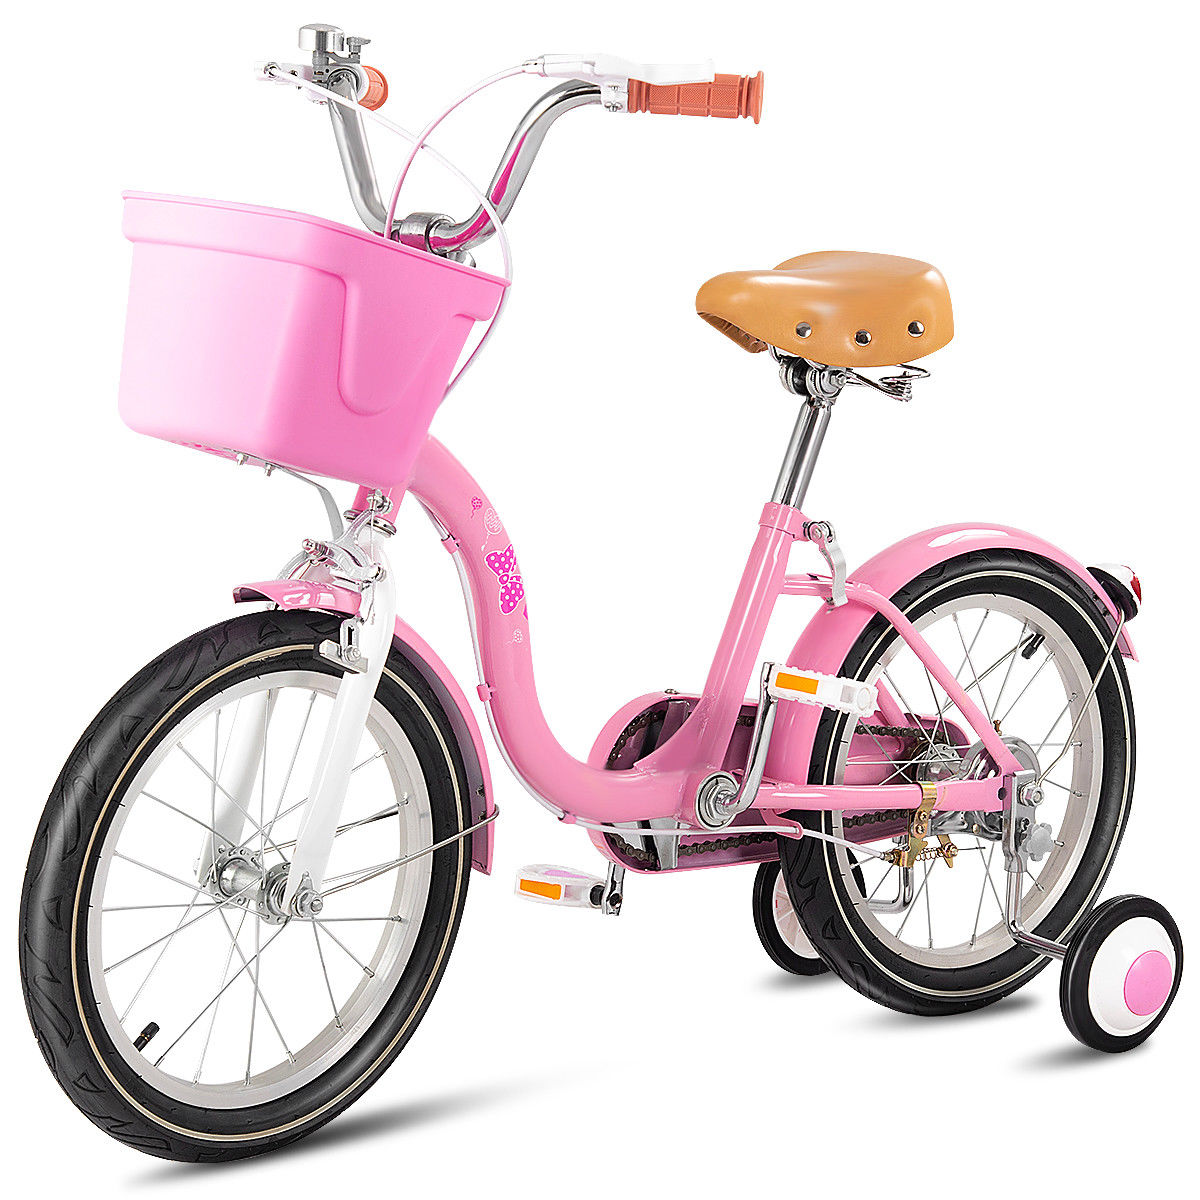 Goplus 16'' Kids Bicycle Bike Outdoor Sports With Training Wheels Basket Bell Pink